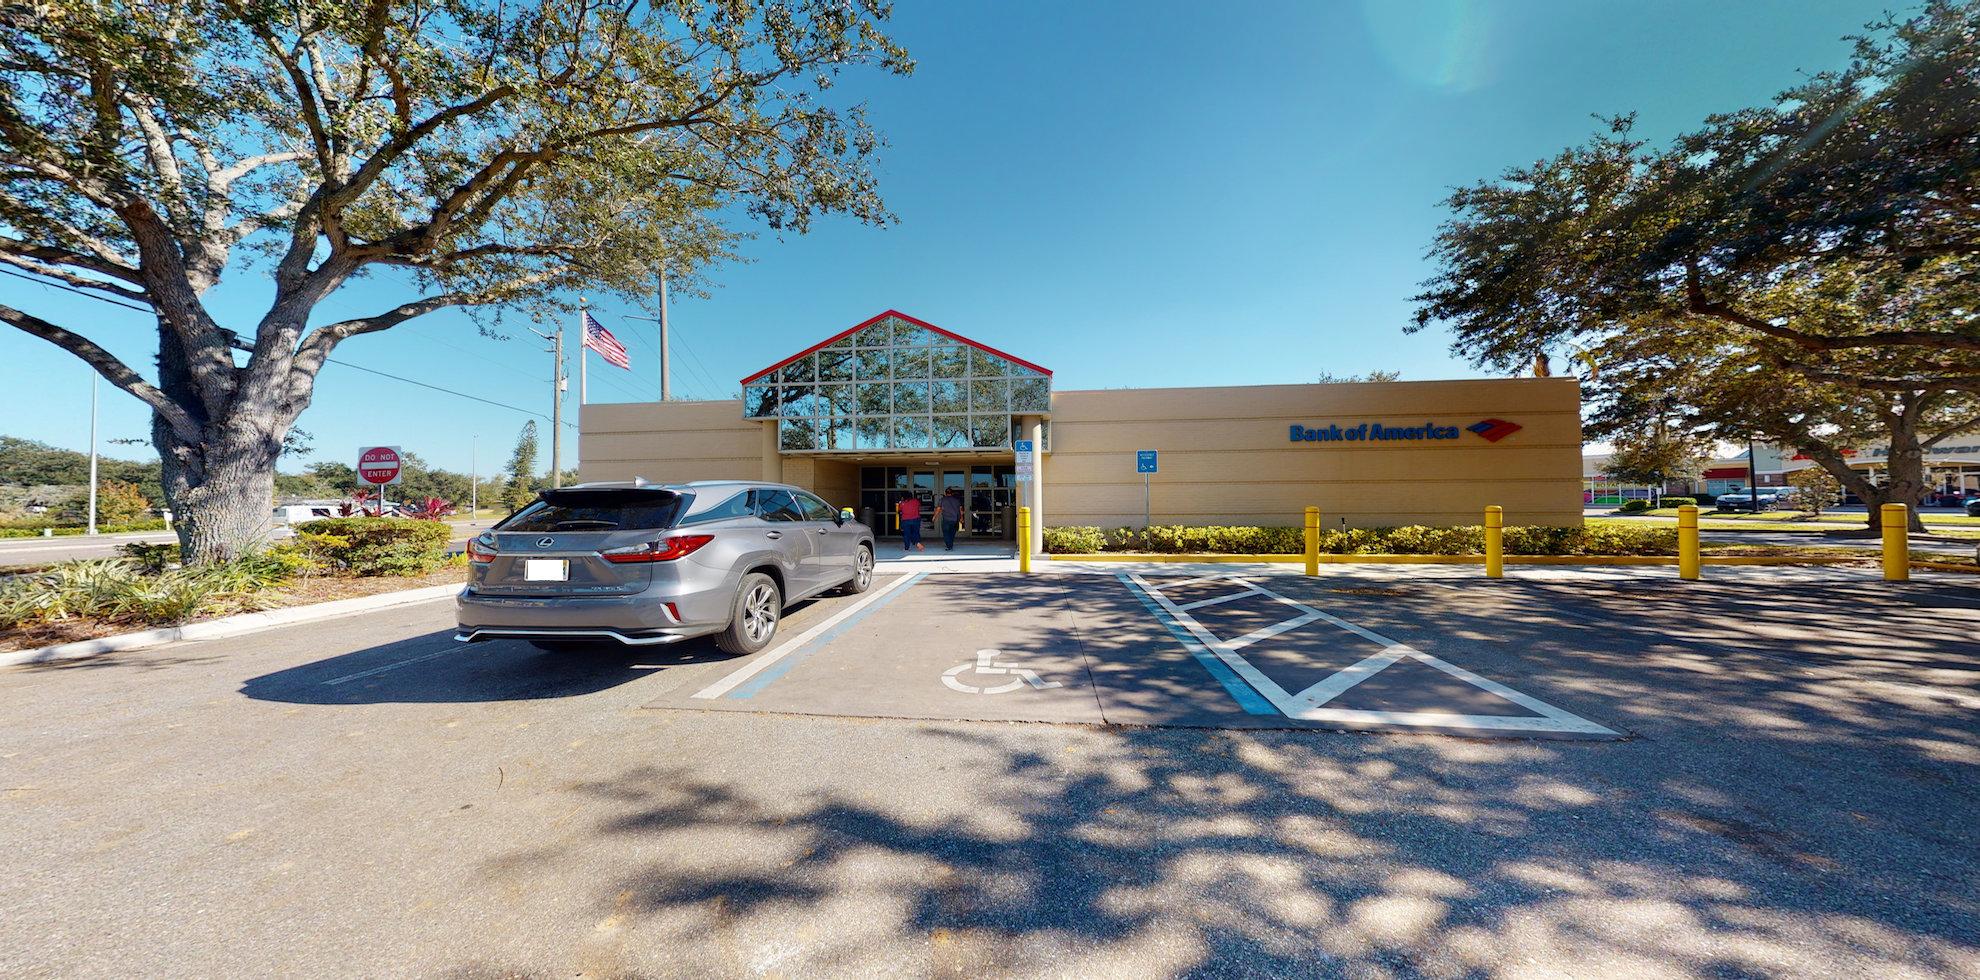 Bank of America financial center with drive-thru ATM | 5315 39th St E, Bradenton, FL 34203